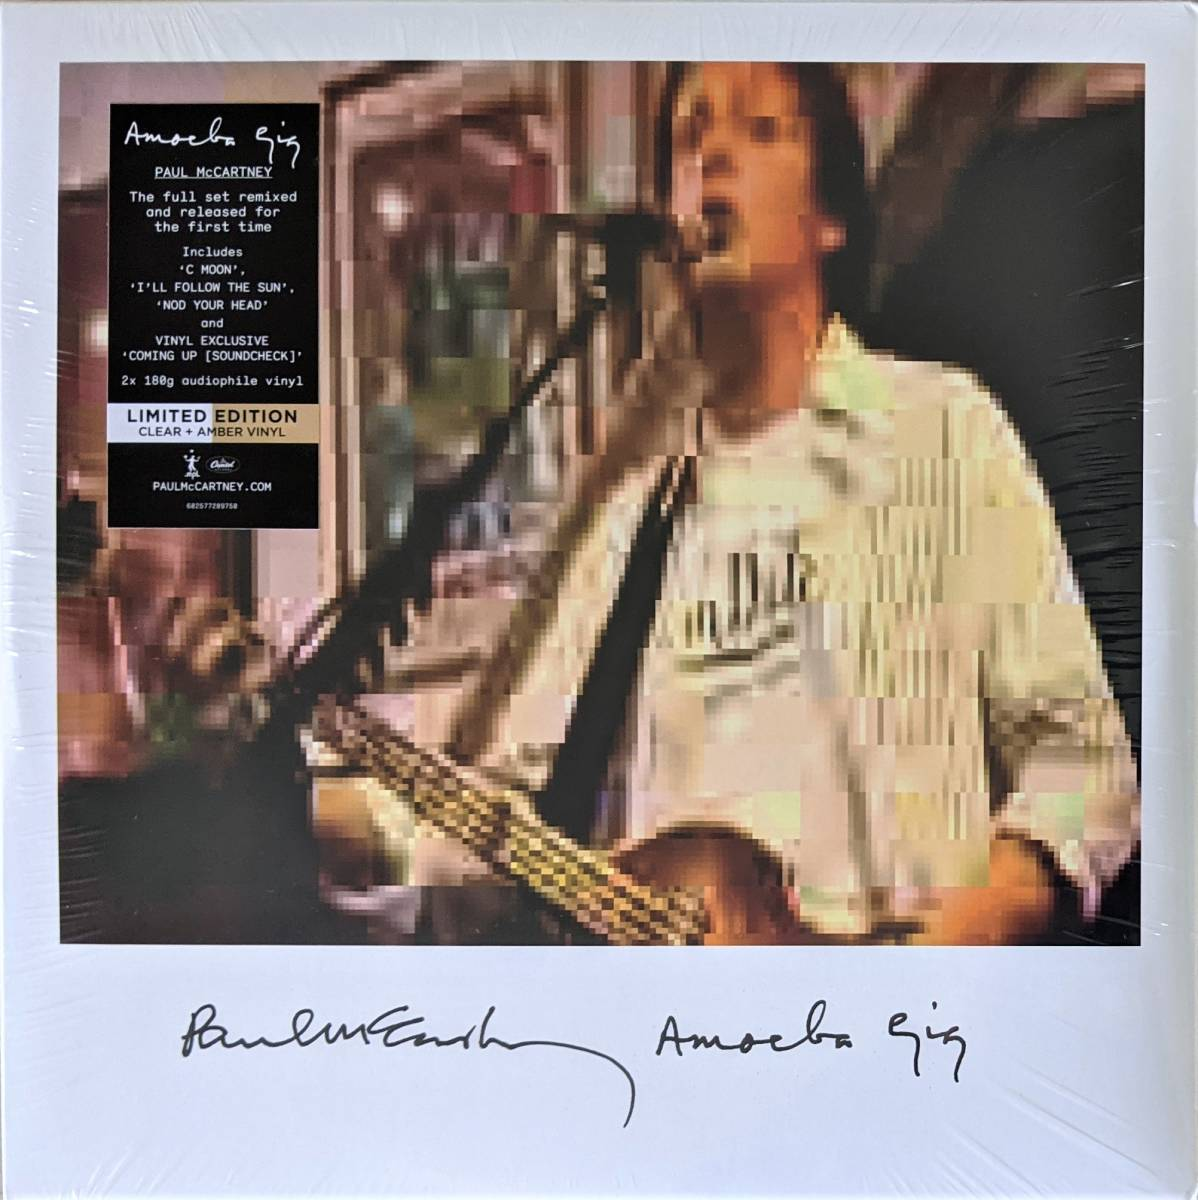 Paul McCartney ポール・マッカートニー - Amoeba Gig 限定二枚組クリア・アンバー・カラー・アナログ・レコード